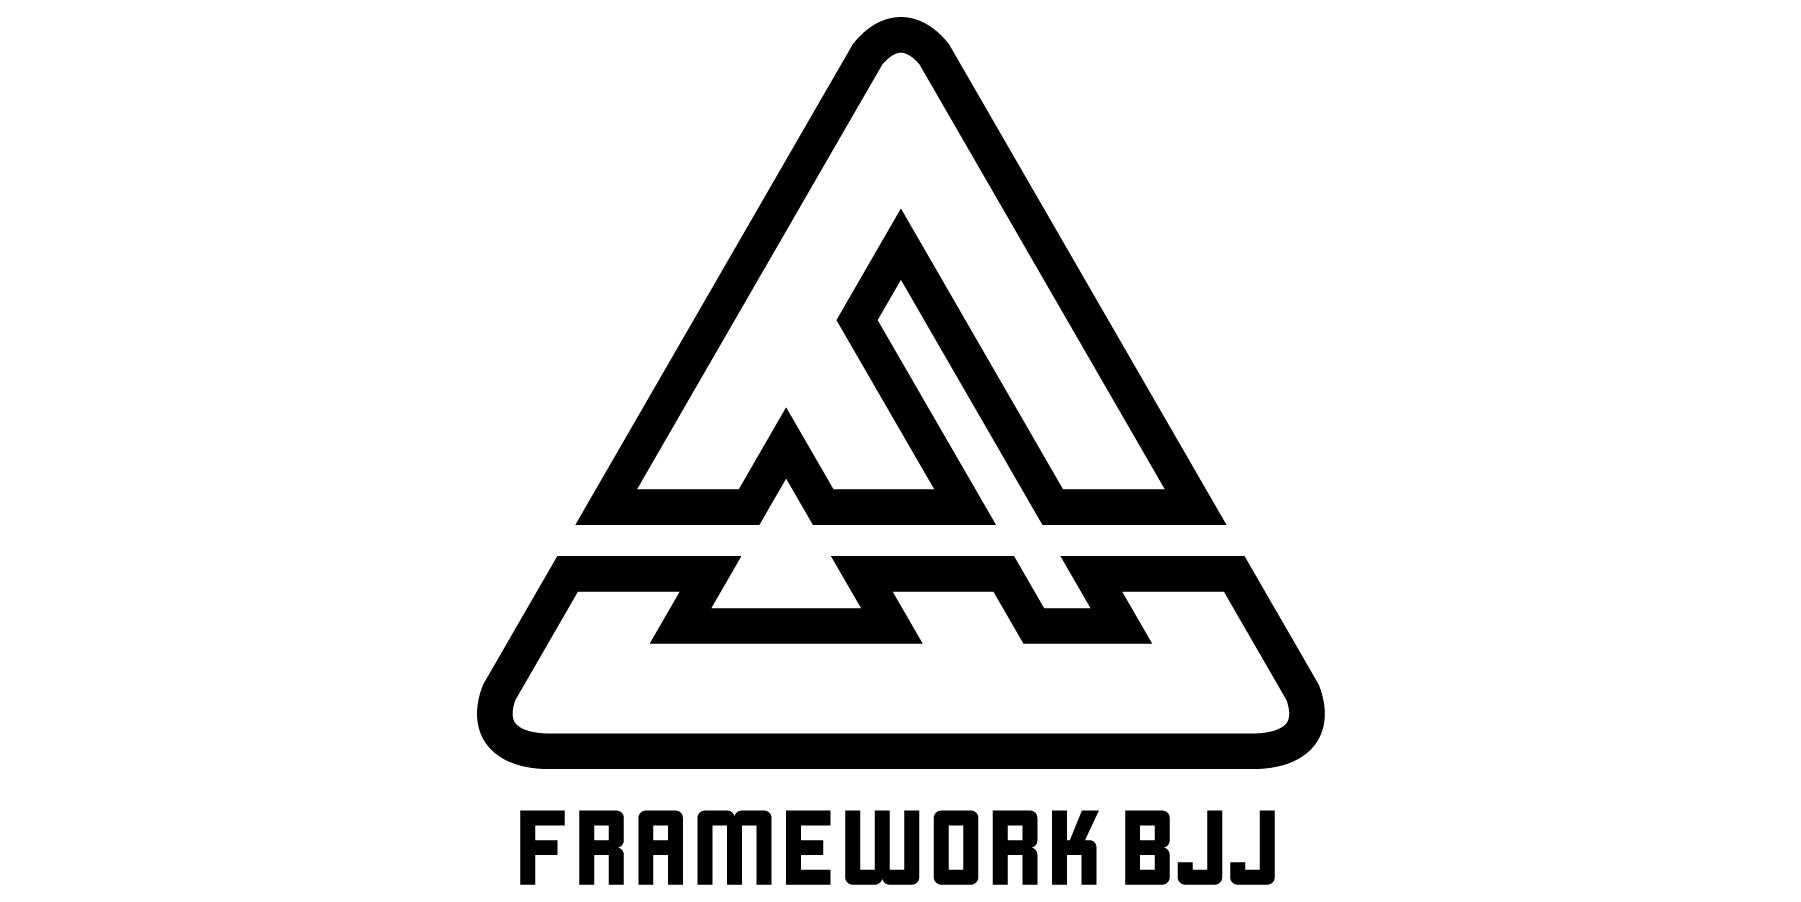 cropped-cropped-framework-bjj-logo-011.png